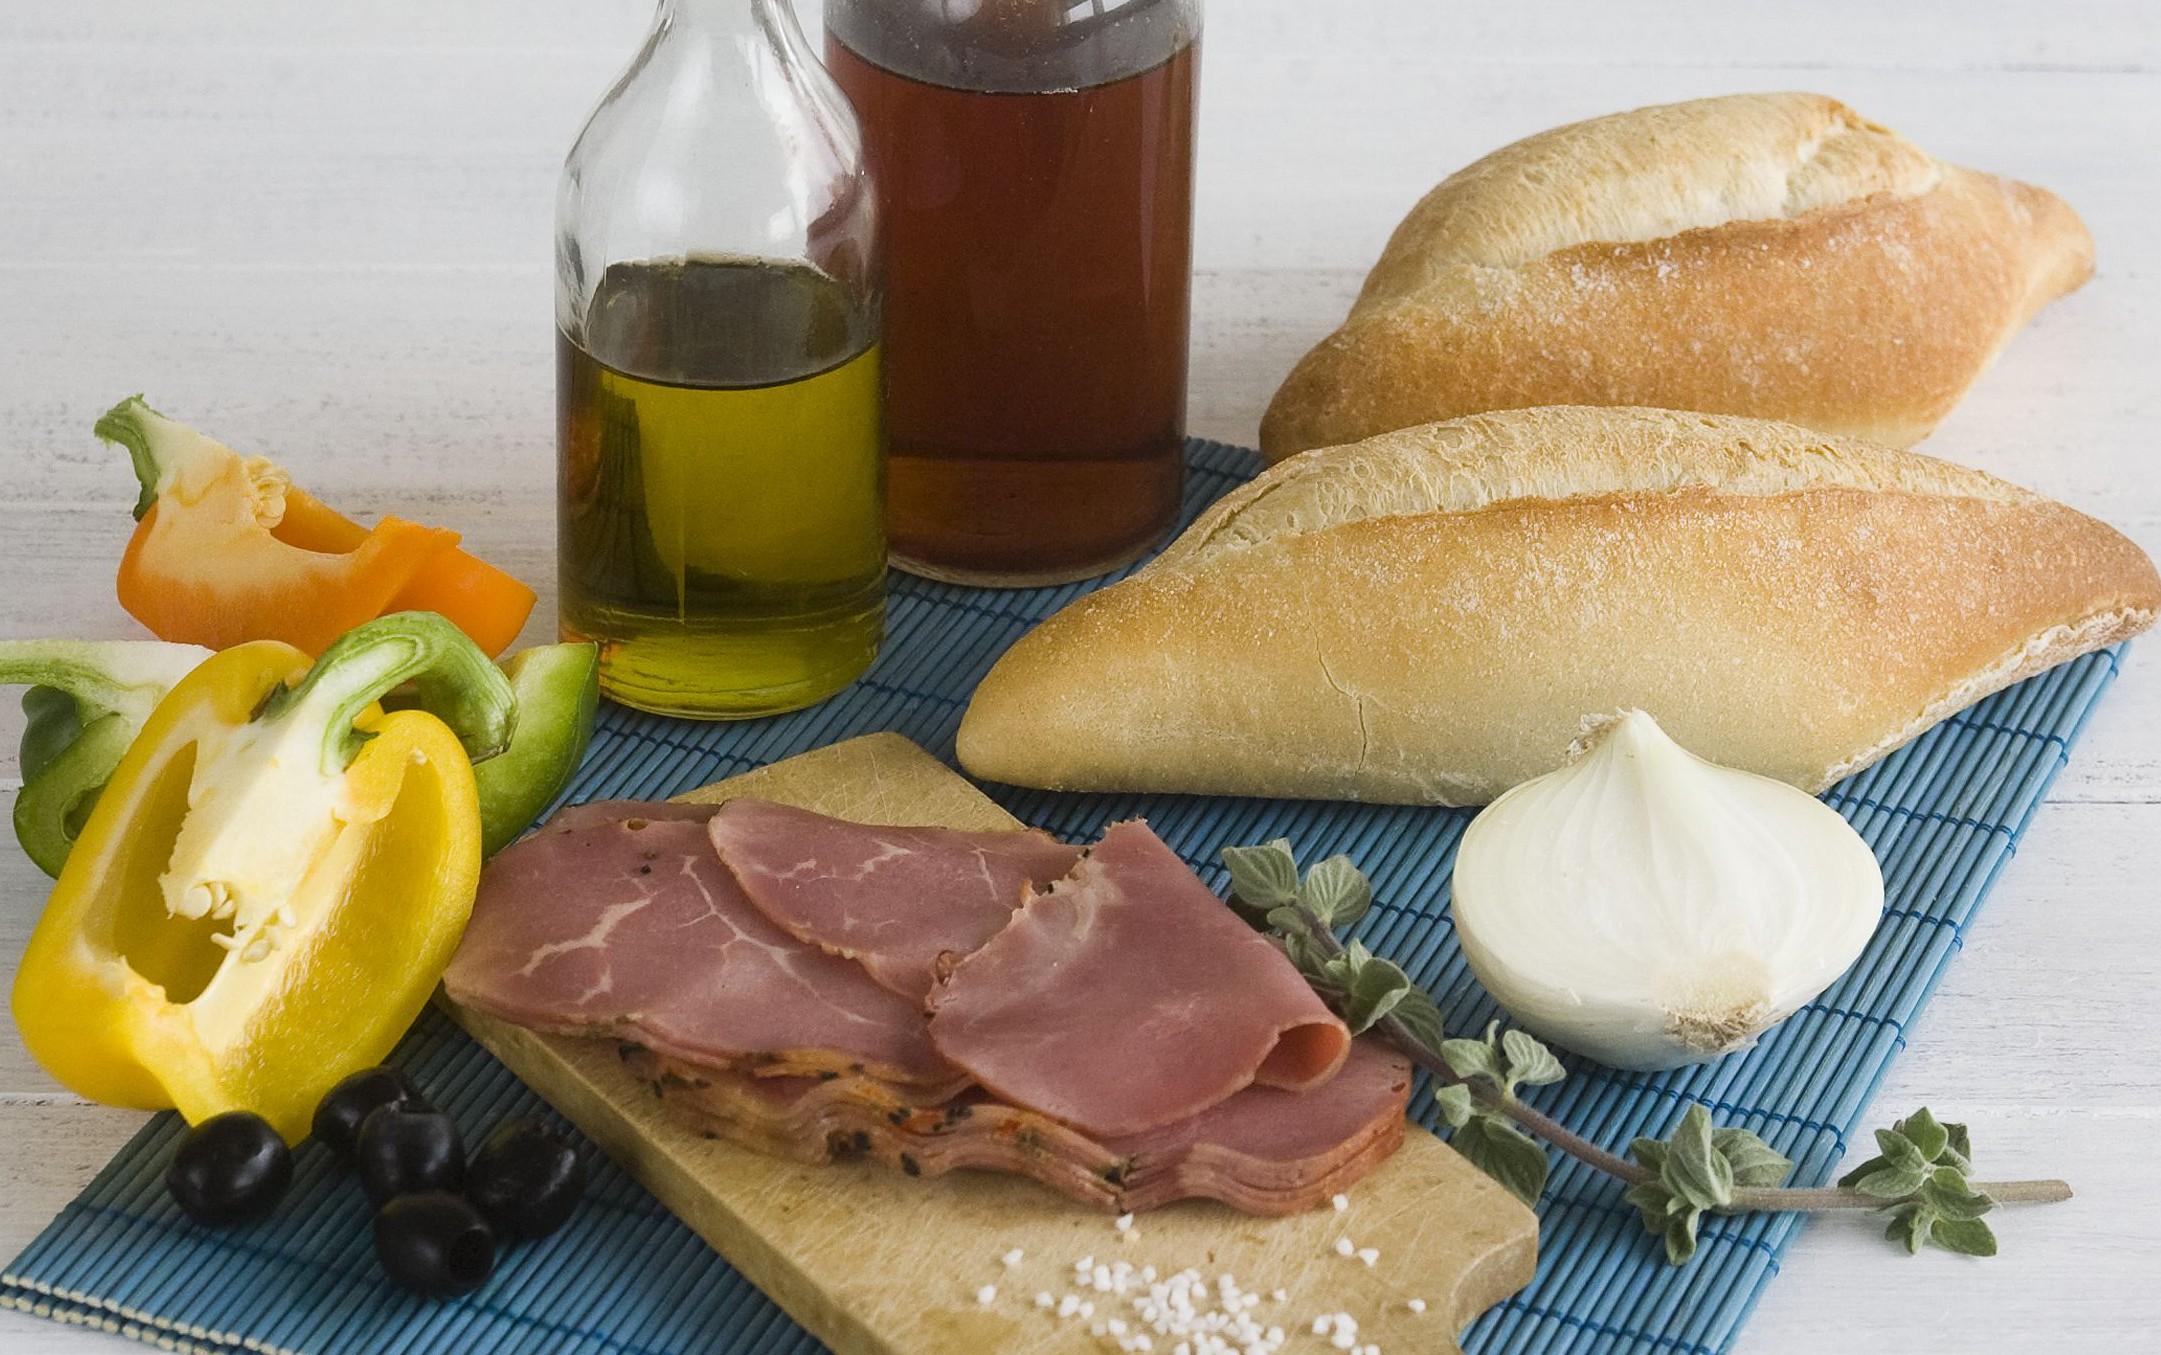 Bagety plnene grilovanymi paprikami a rosbifem - suroviny